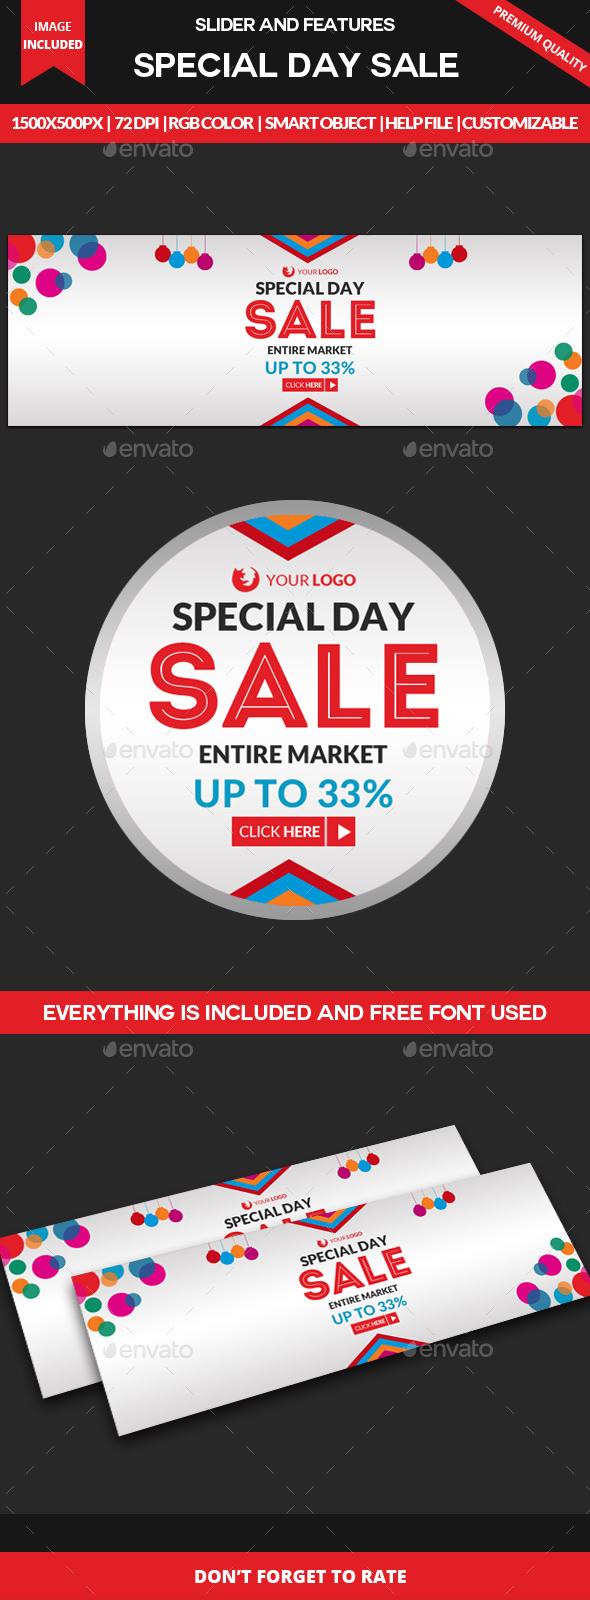 Sale Slider - Sliders & Features Web Elements